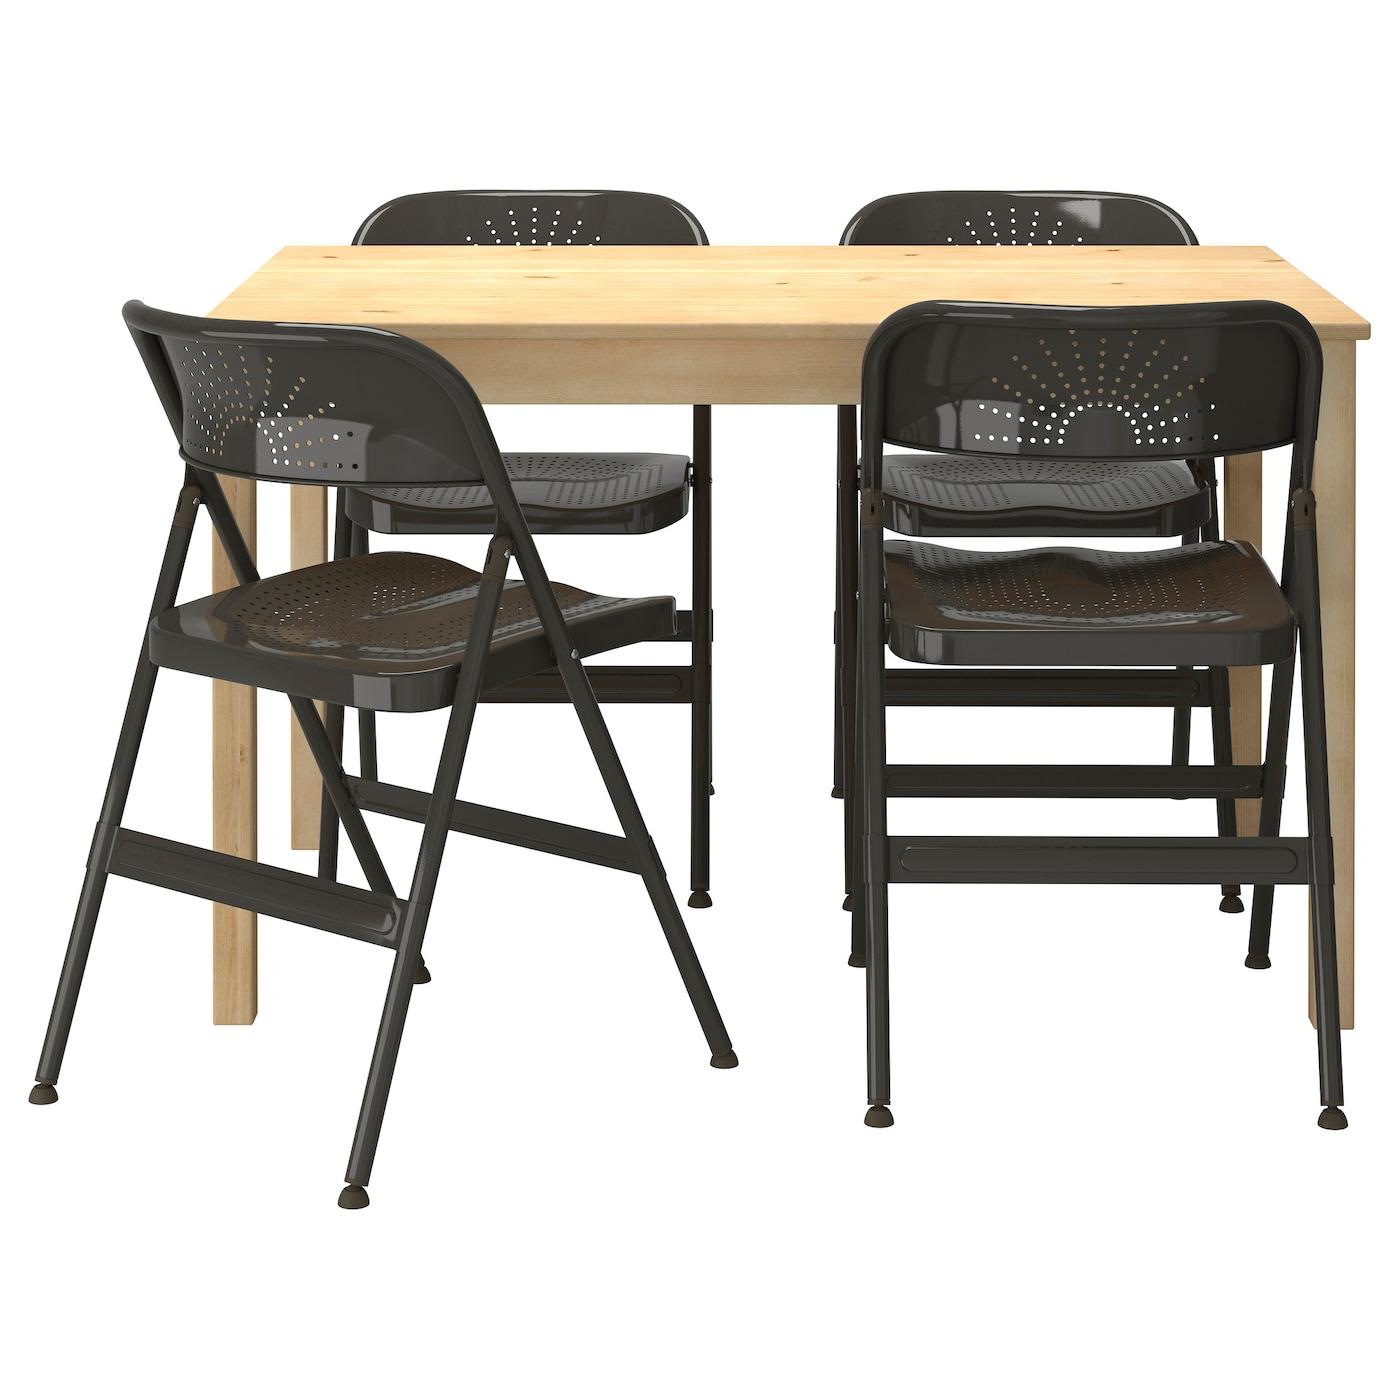 FRODE INGO Table And 4 Chairs Pine Dark Grey 120 Cm IKEA